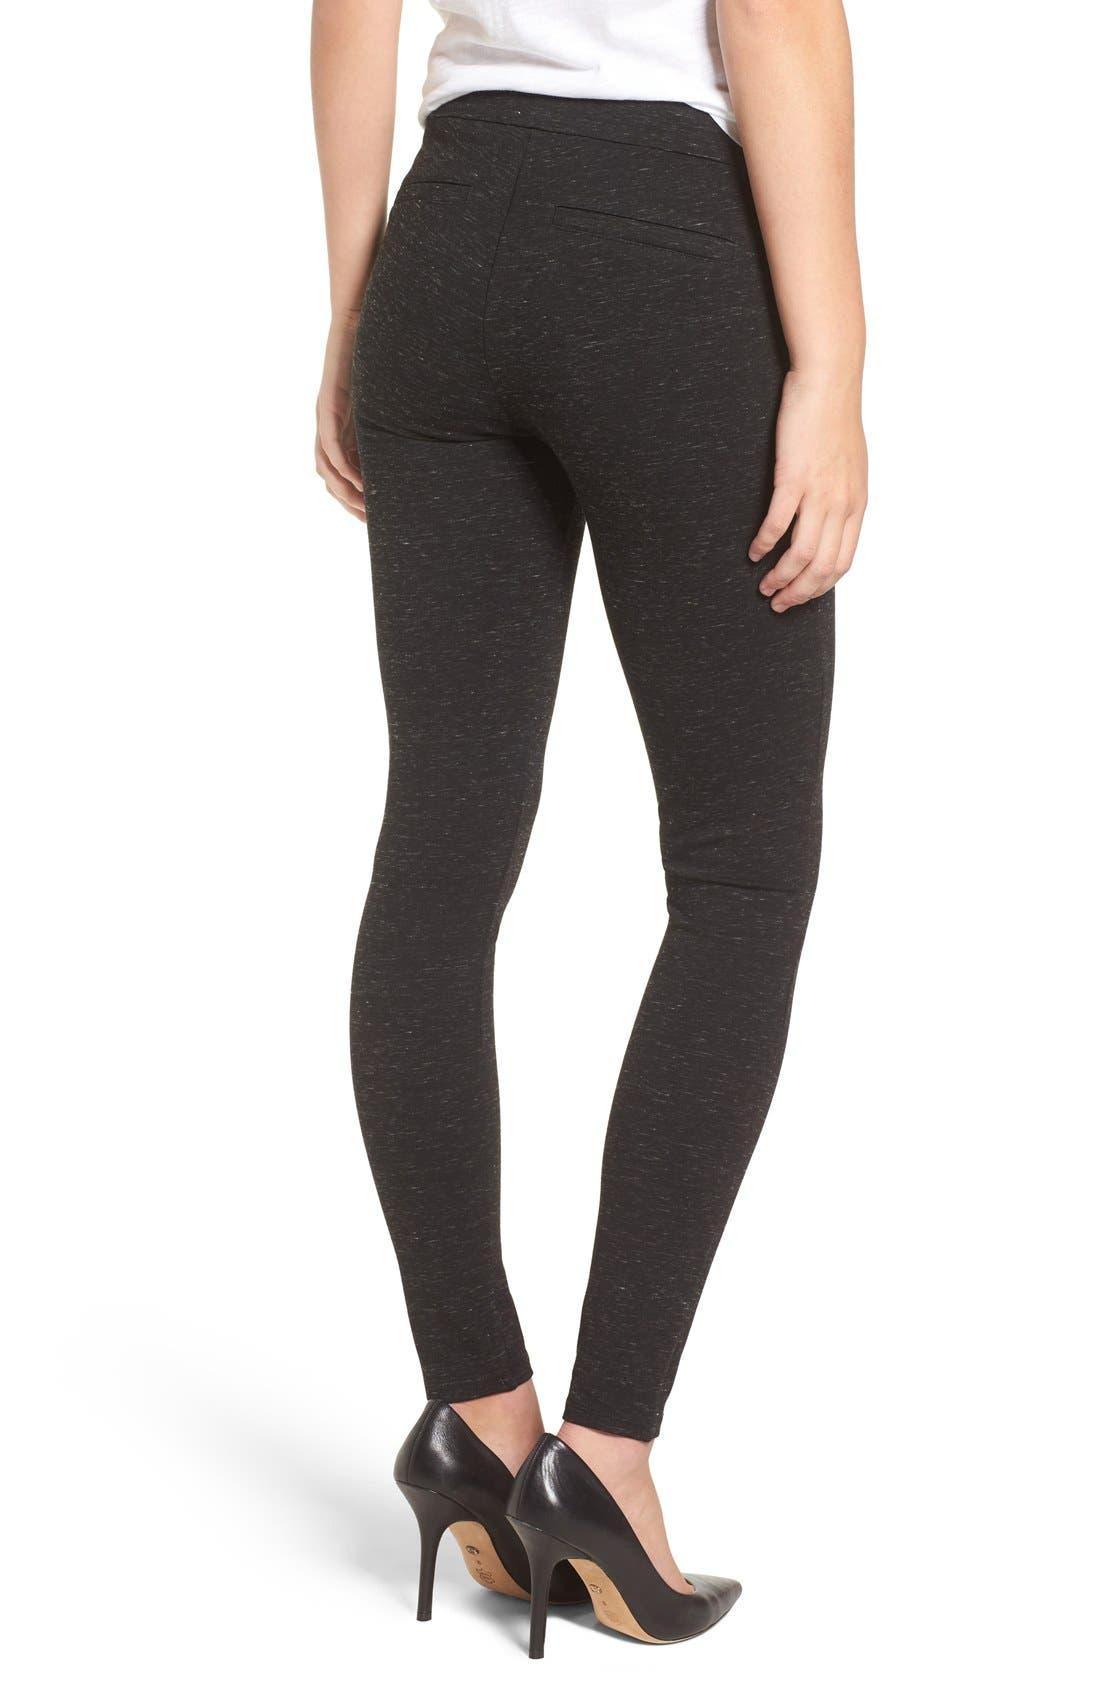 Alternate Image 2  - Wit & Wisdom Ponte Knit Pants (Regular & Petite) (Nordstrom Exclusive)